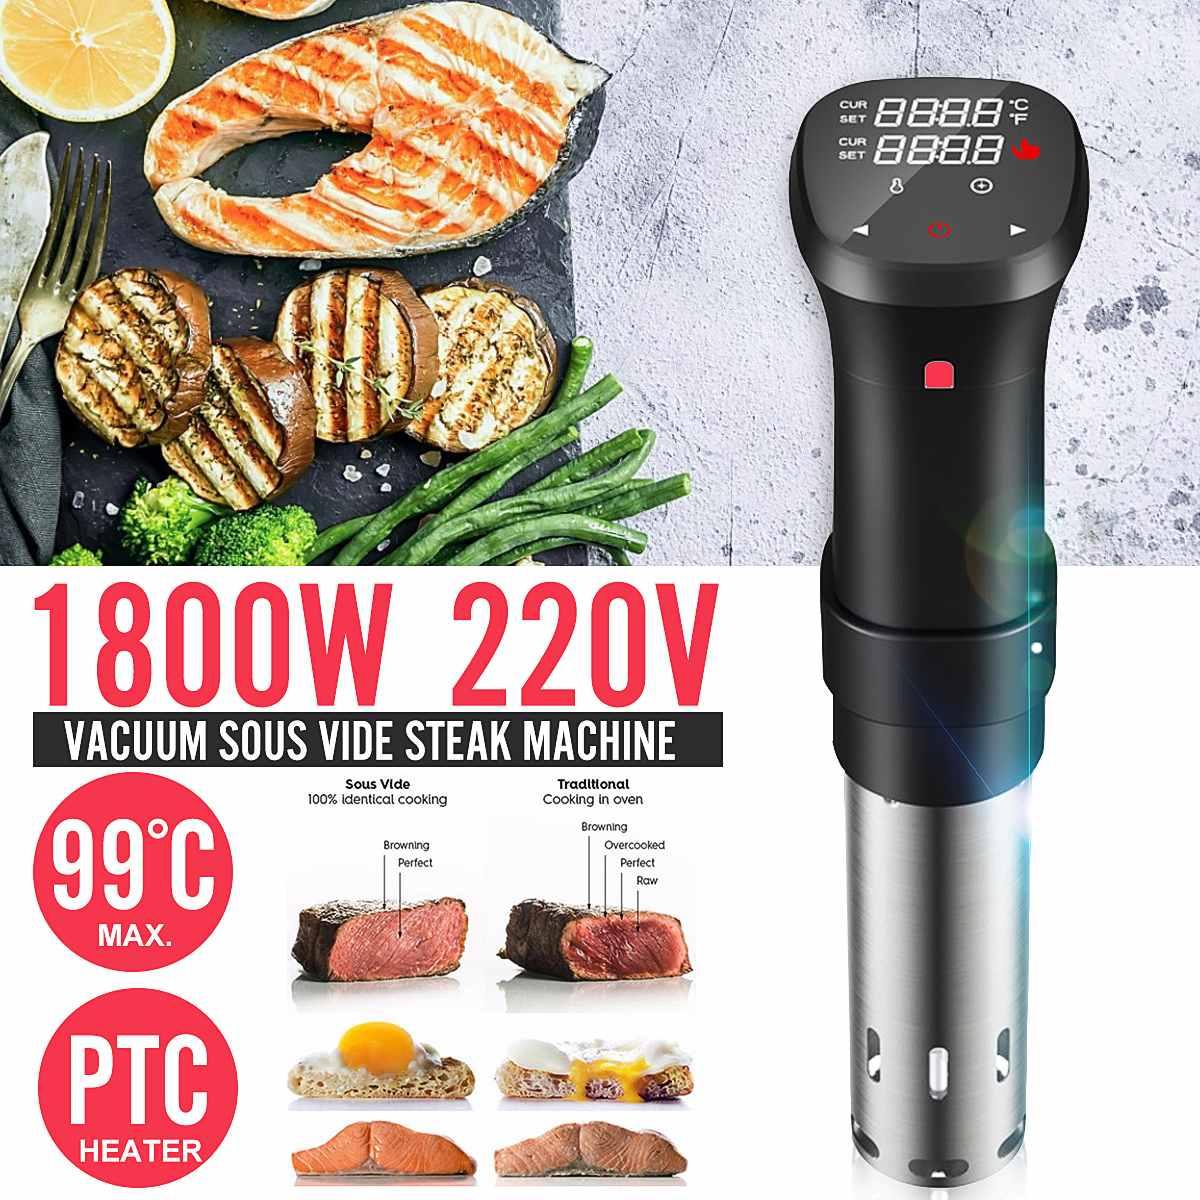 Vacuum Slow Sous Vide Food Cooker 1800W LCD Digital Timer Display Fast Cycle Heating Low Temperature Vacuum Food Processing Tool